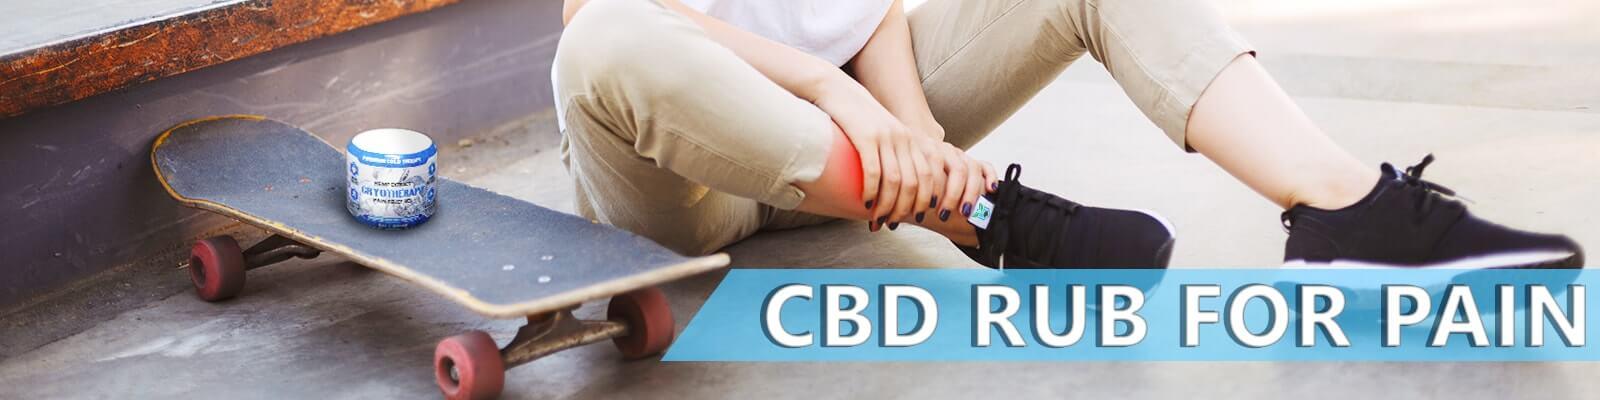 cbd rub for pain